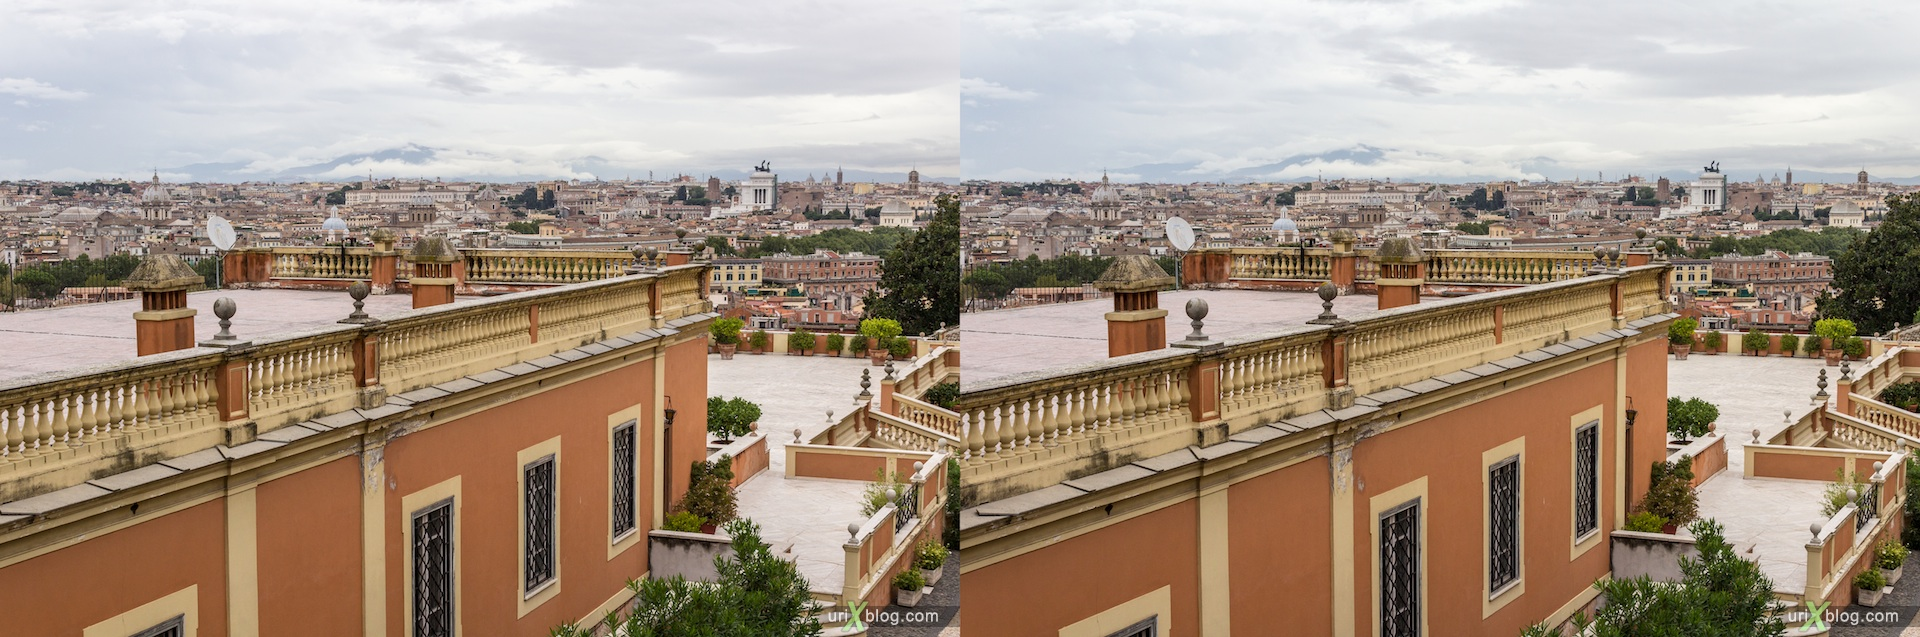 2012, dell Acqua Paola fountain, via Garibaldi street, city view, viewpoint, panorama, Rome, Italy, Europe, 3D, stereo pair, cross-eyed, crossview, cross view stereo pair